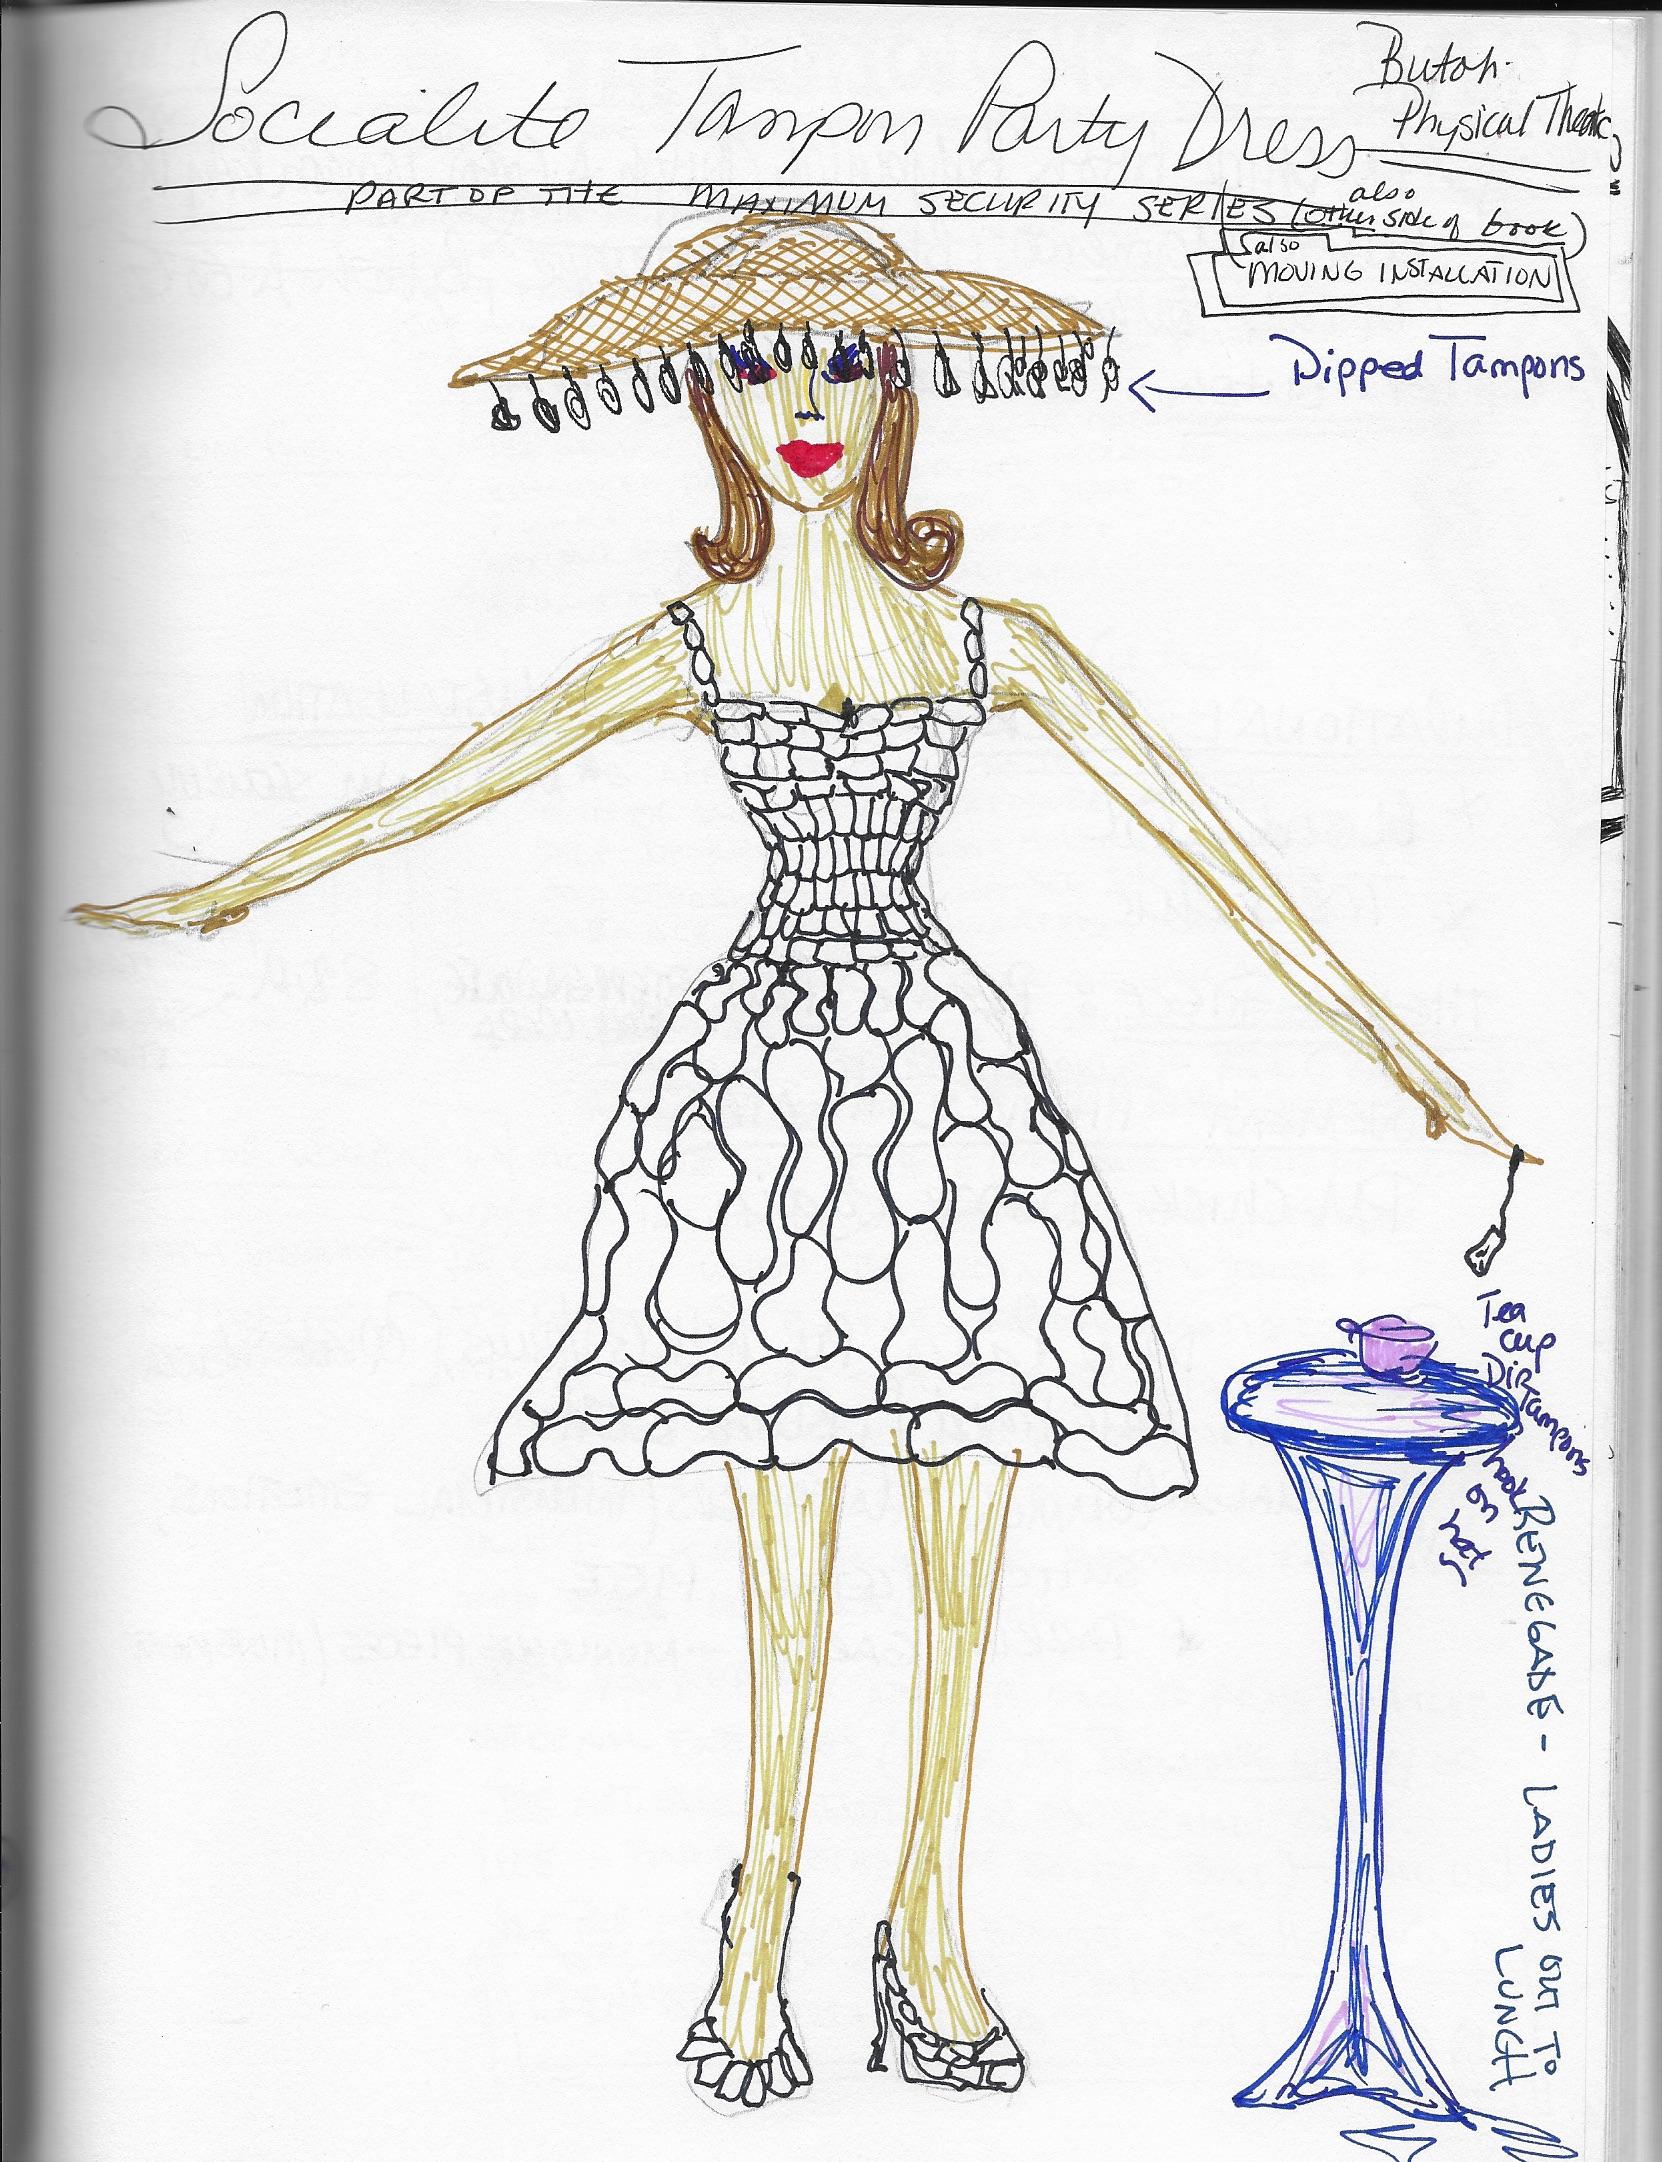 Socialite Tampon Party Dress.jpg